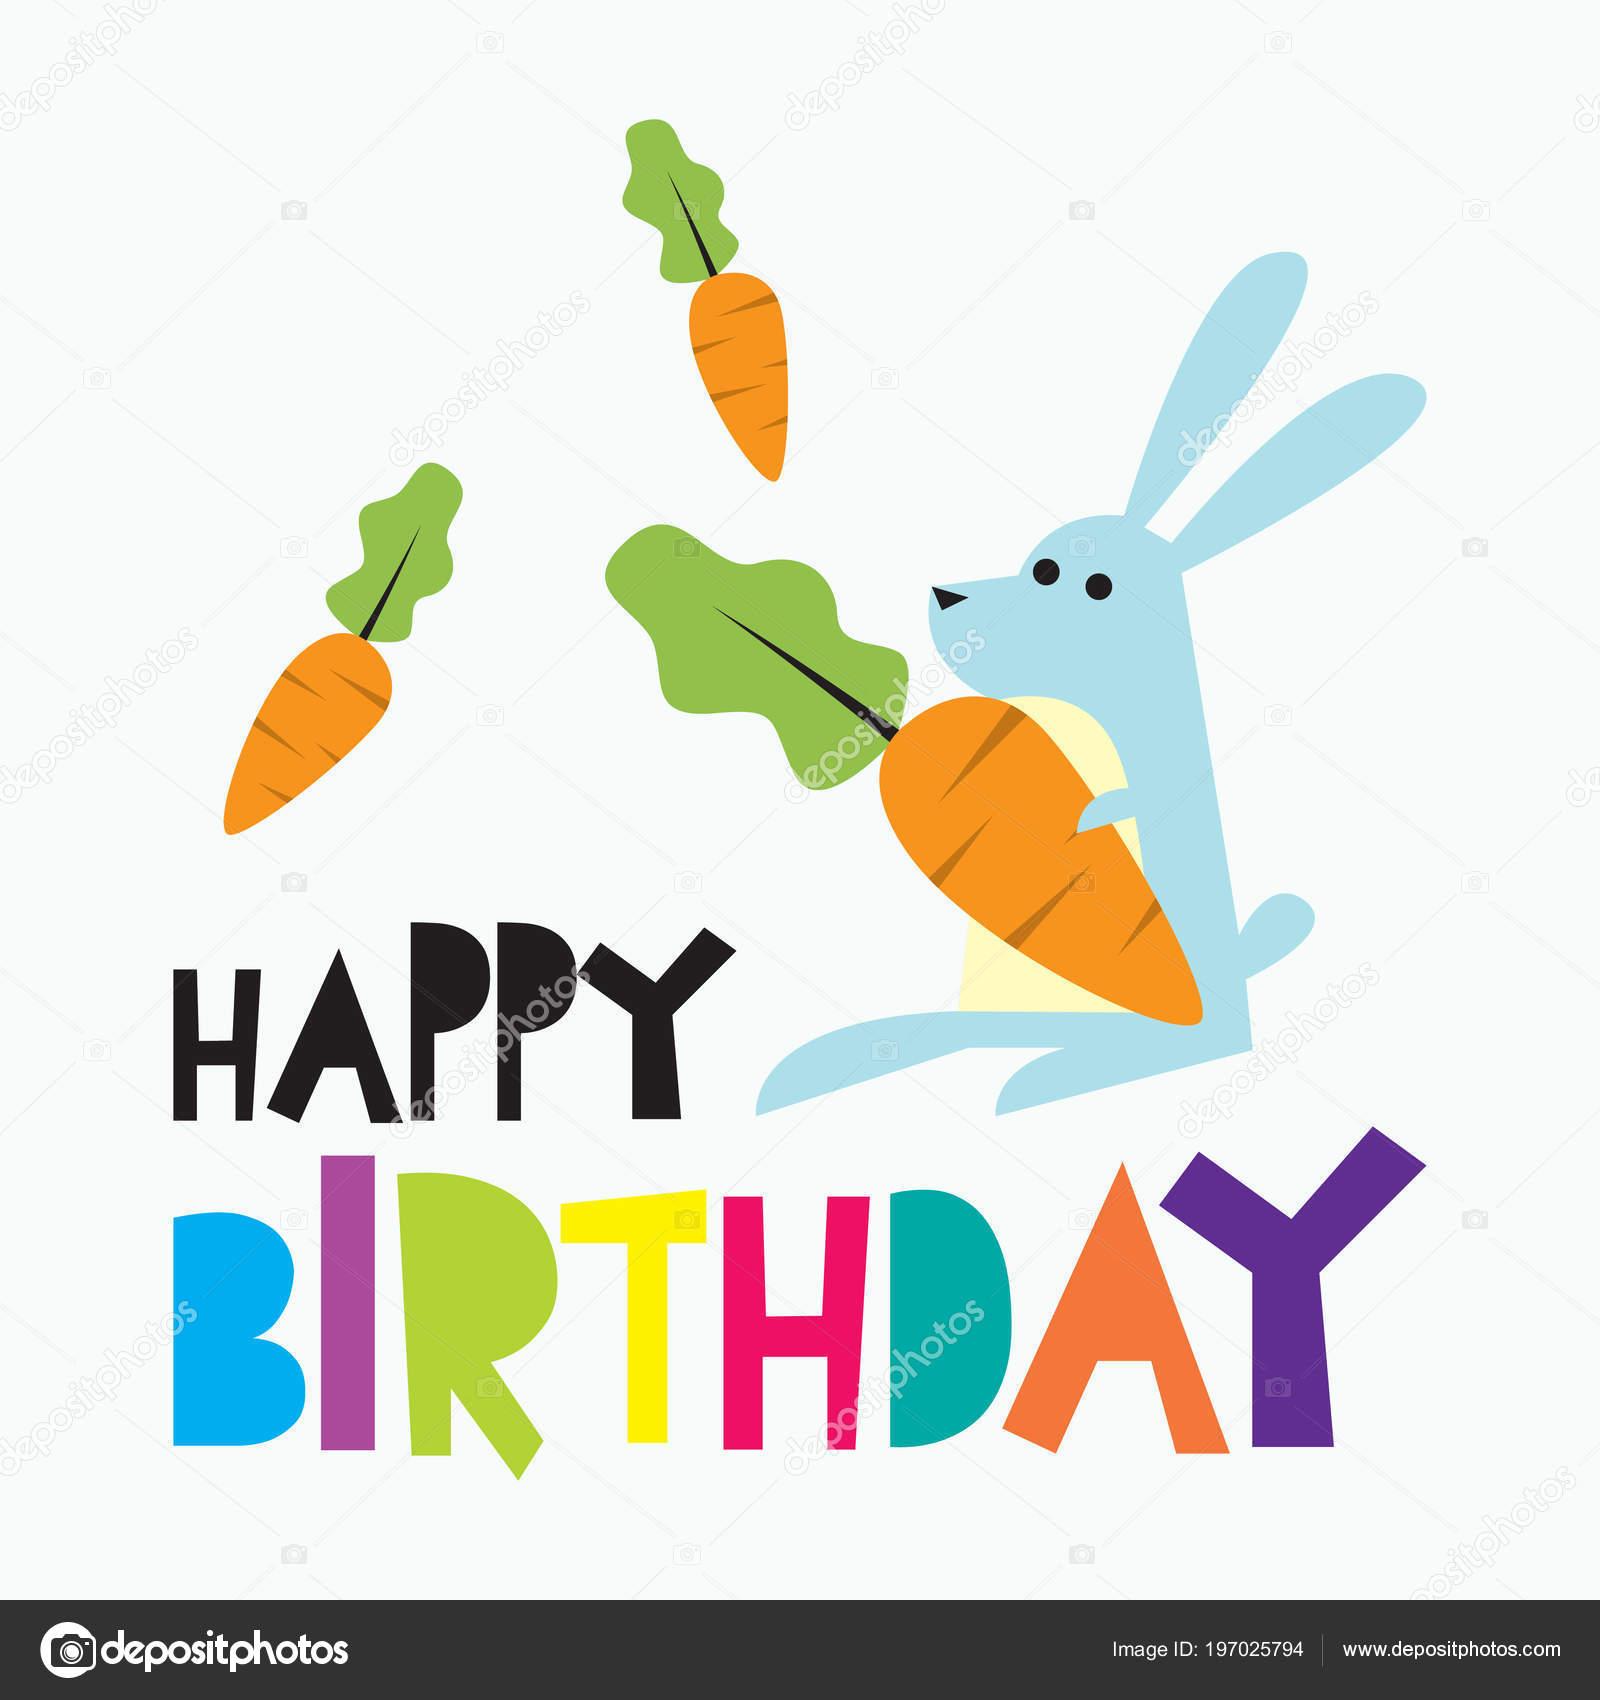 Birthday Card Poster Design Children Colorful Birthday Card Design